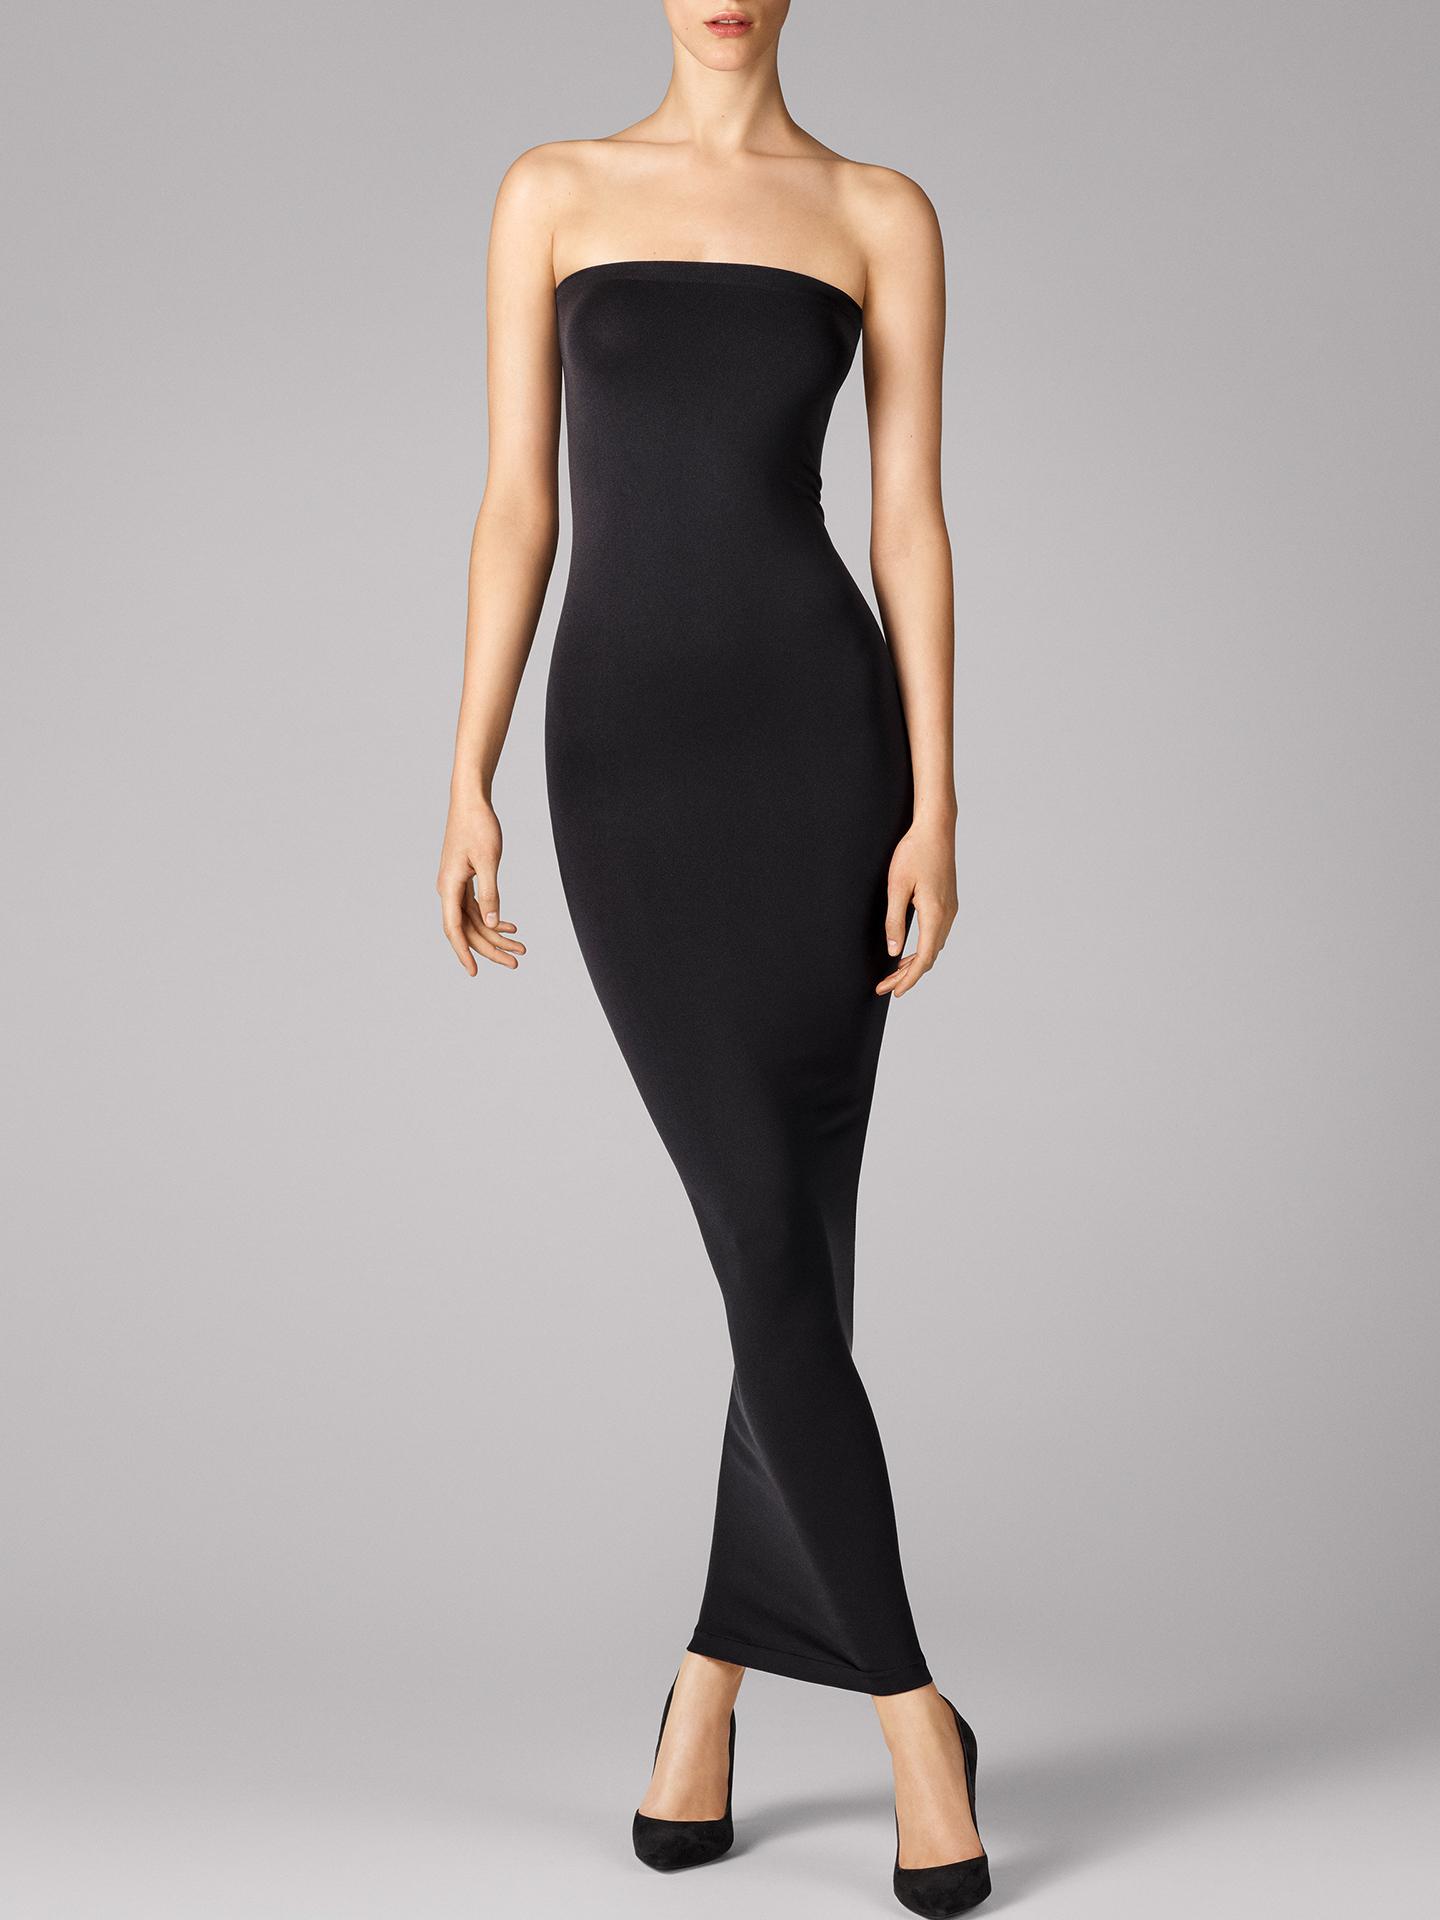 Wolford Apparel & Accessories > Clothing > Vestiti FATAL Dress - 7005 - XS